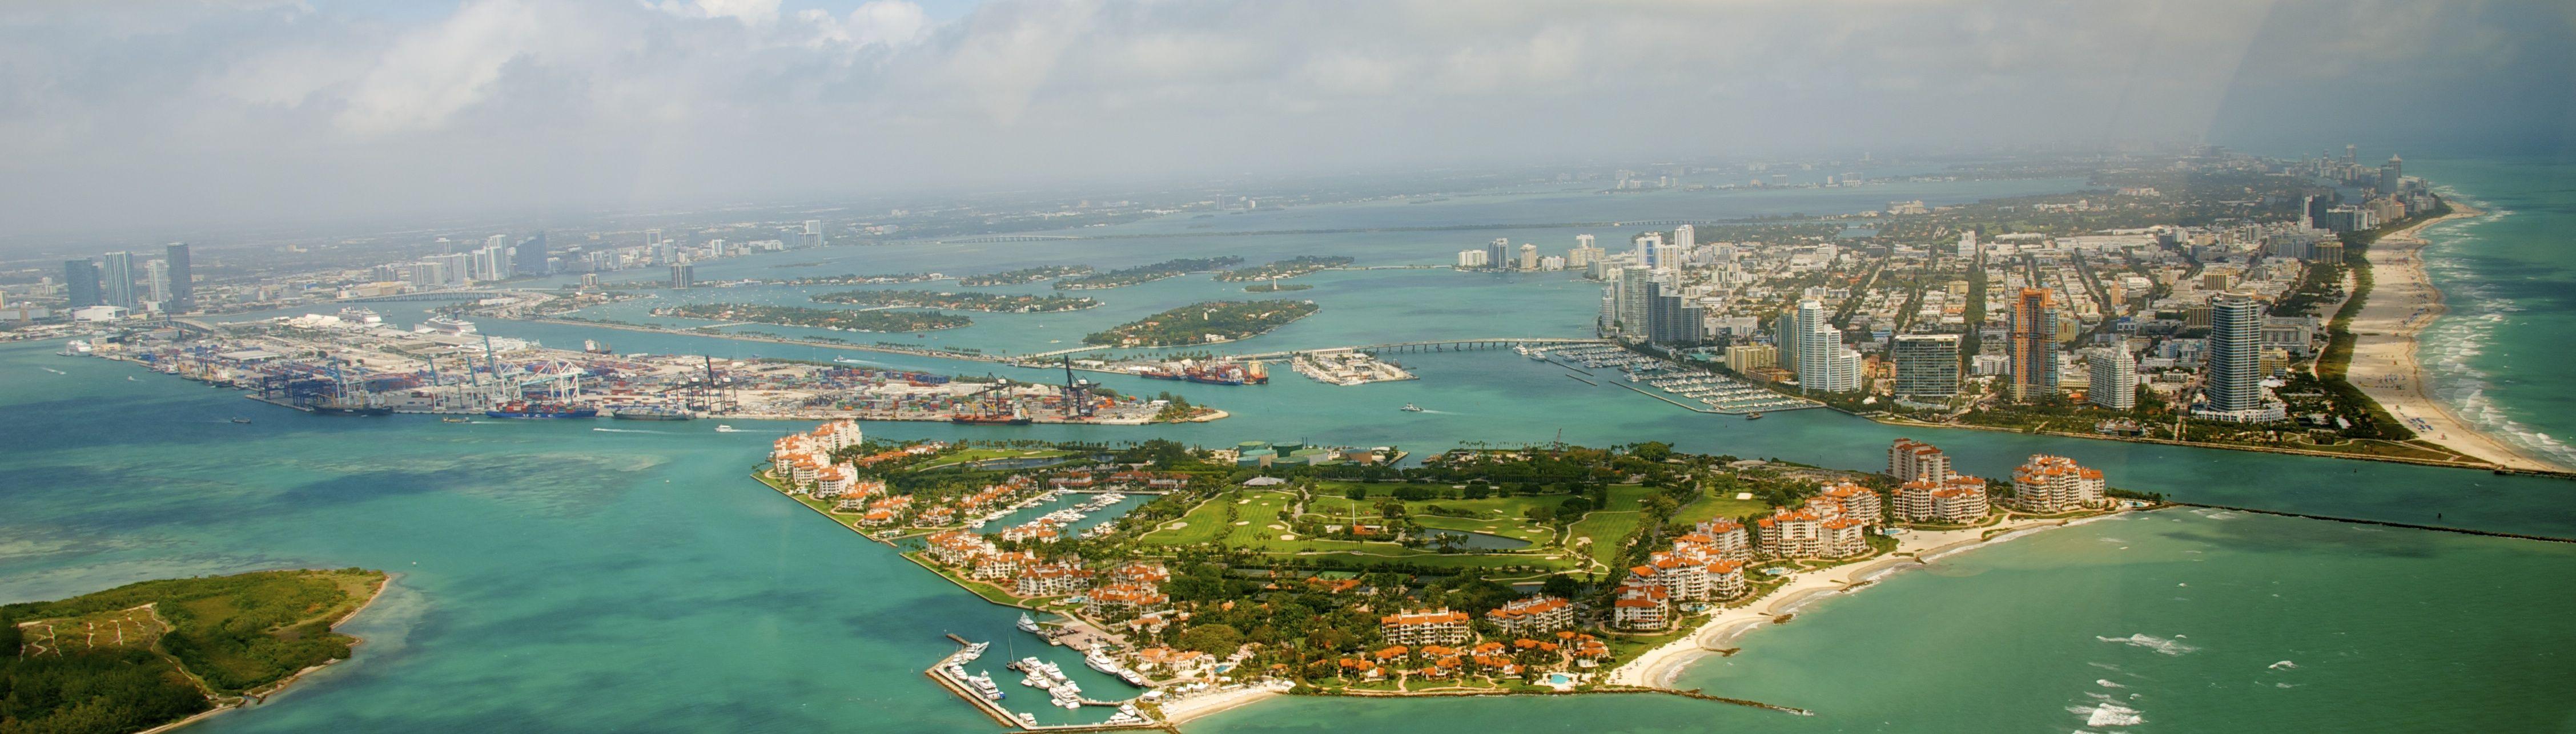 Aerial Tour cityscape